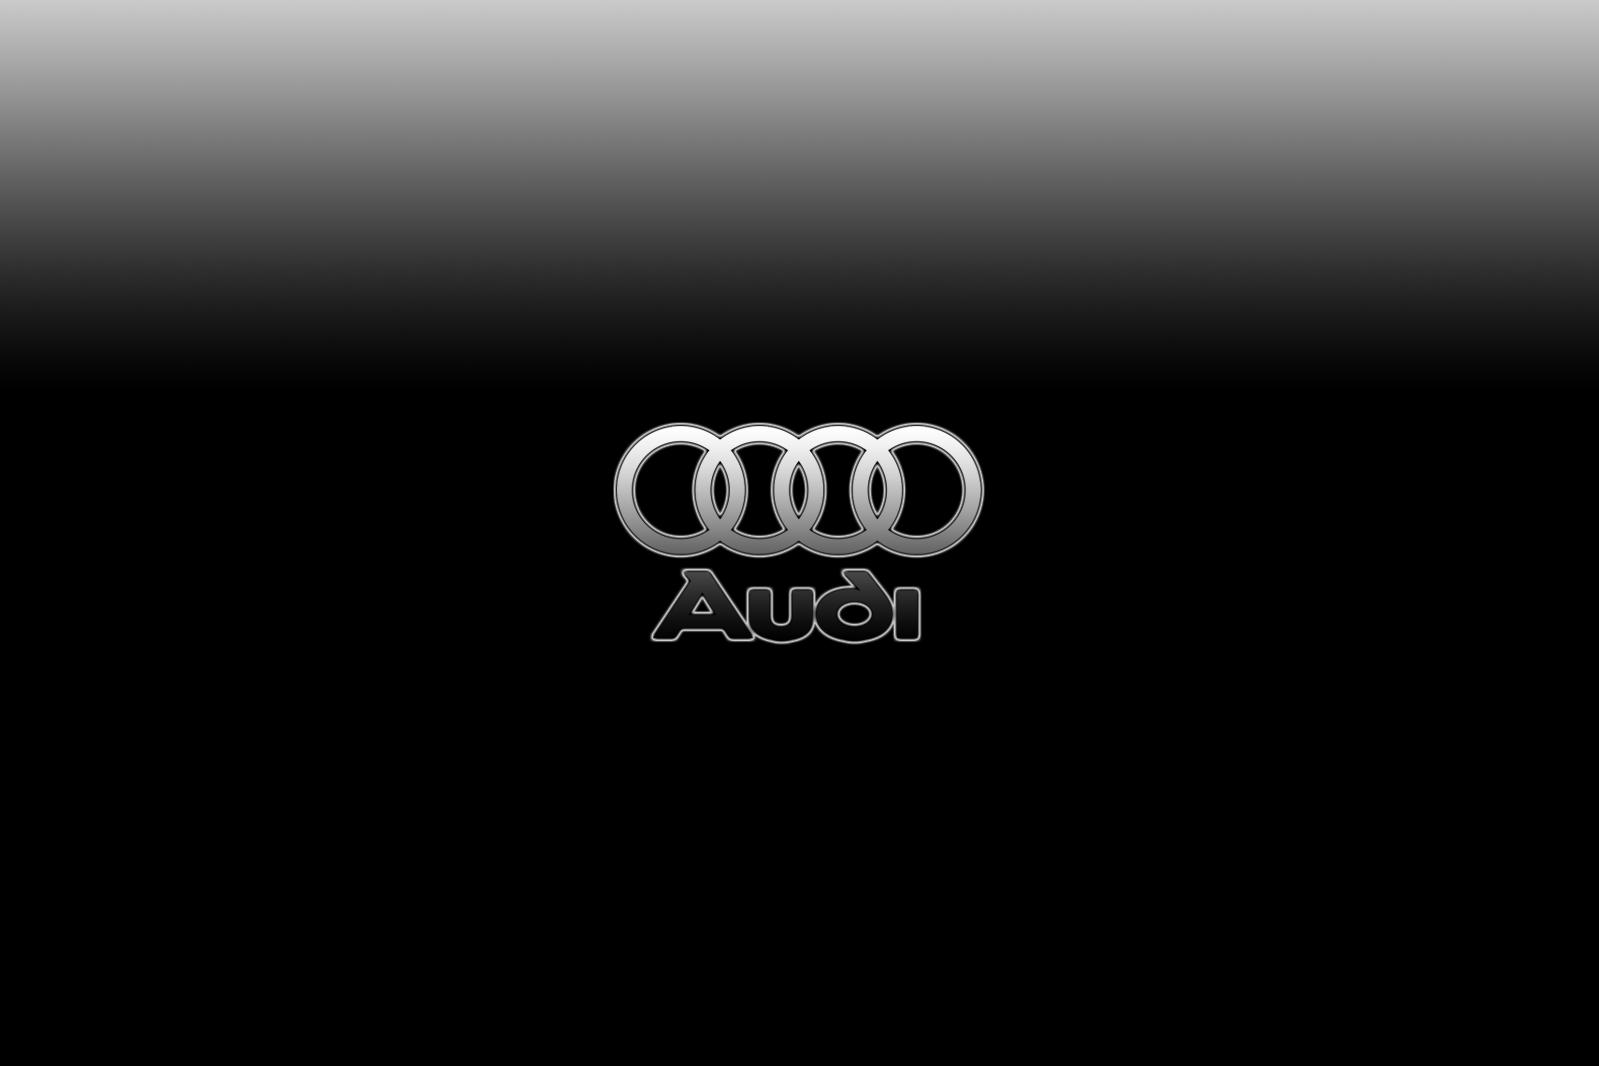 Audi Logo Wallpaper